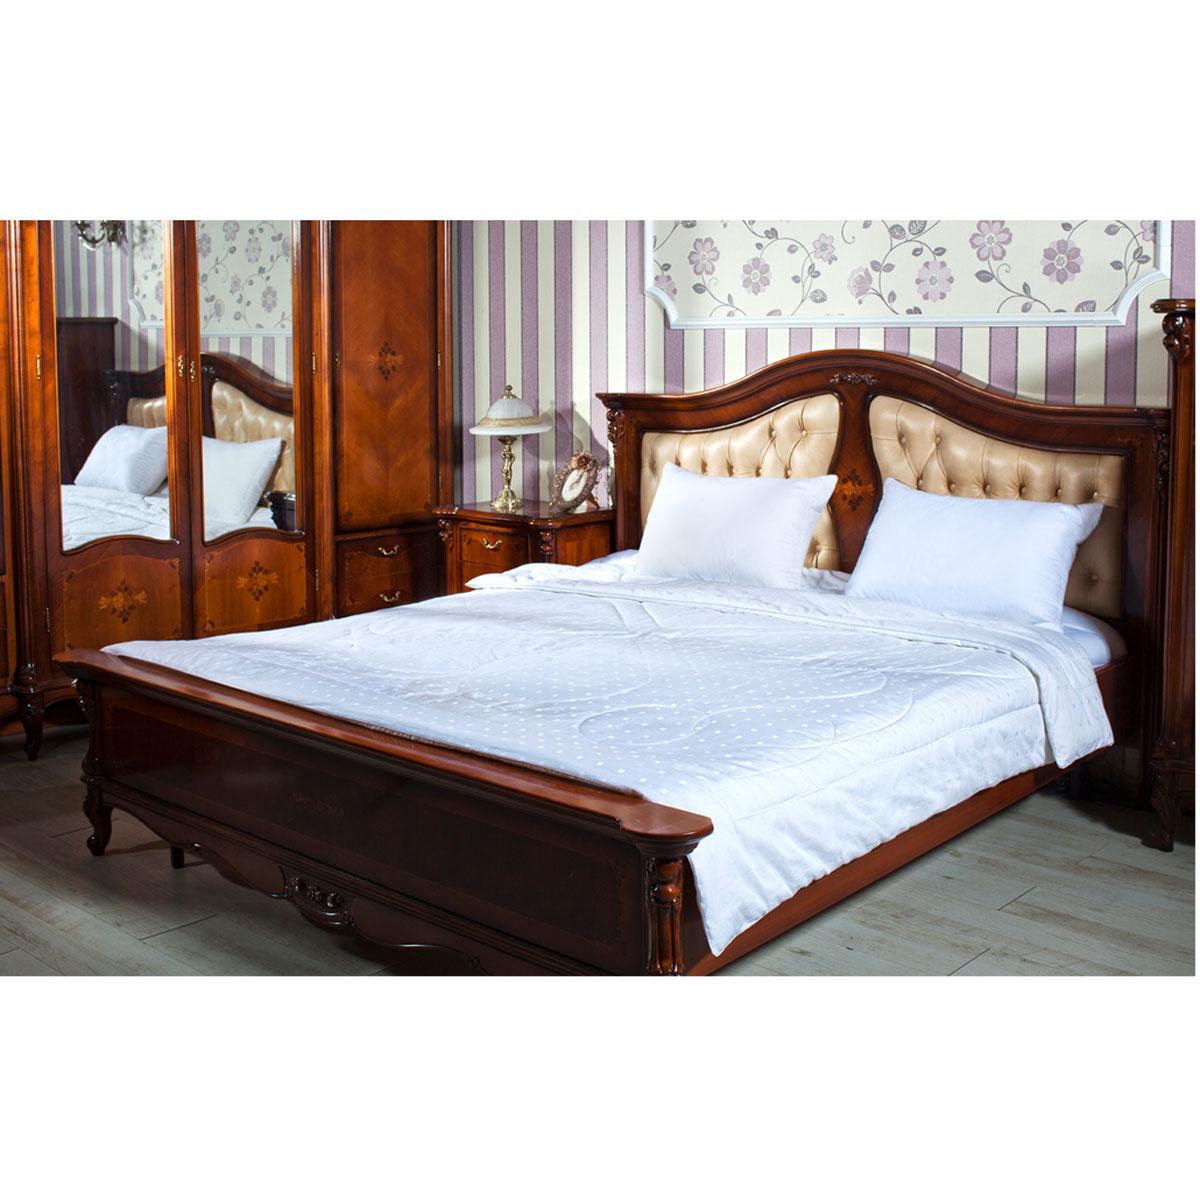 "Одеяло ""Silk"" 200 х 220 см, белый"